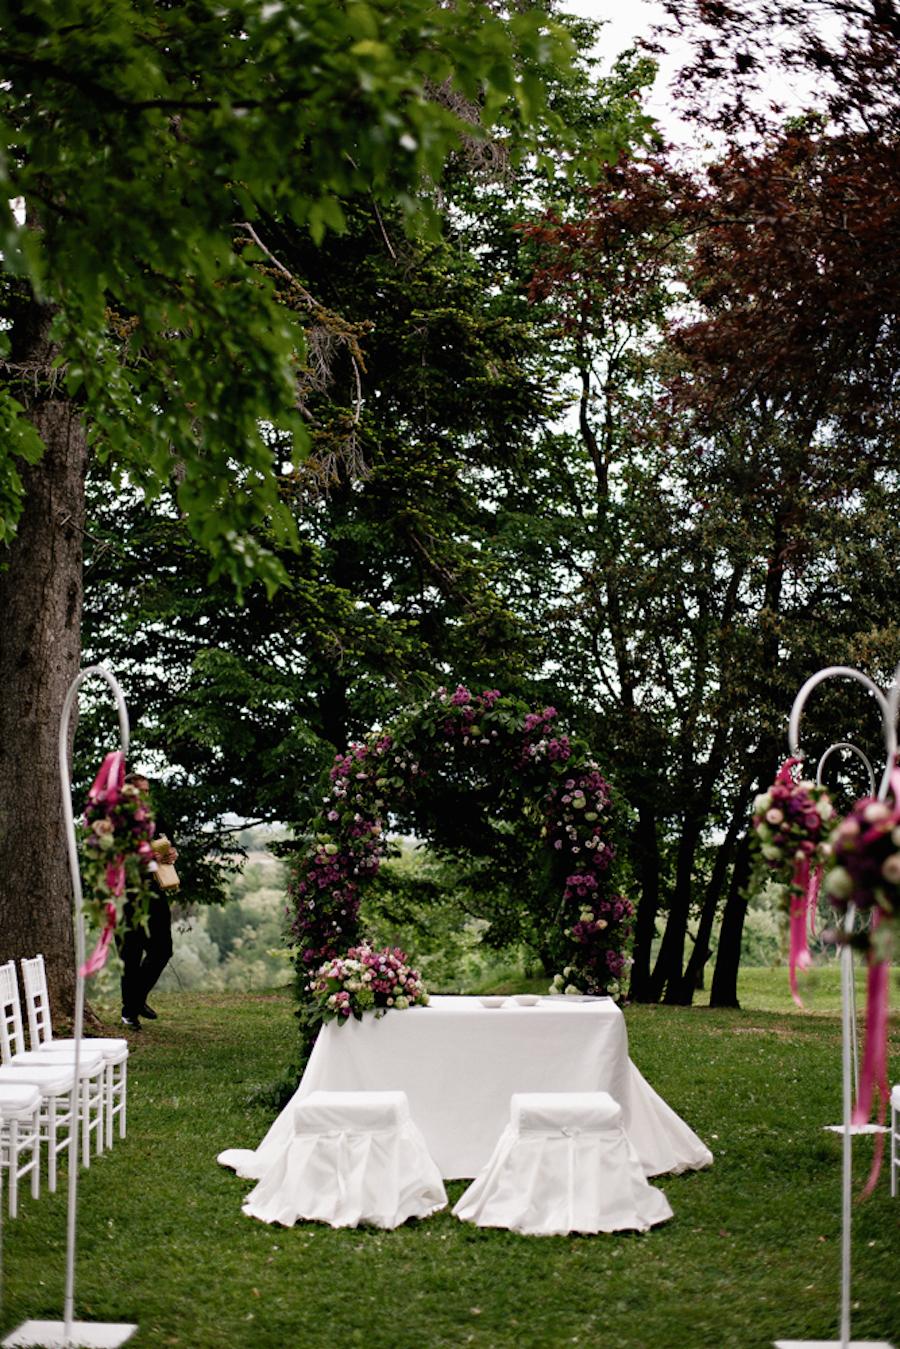 Matrimonio In Un Castello : Un matrimonio raffinato in castello wedding wonderland